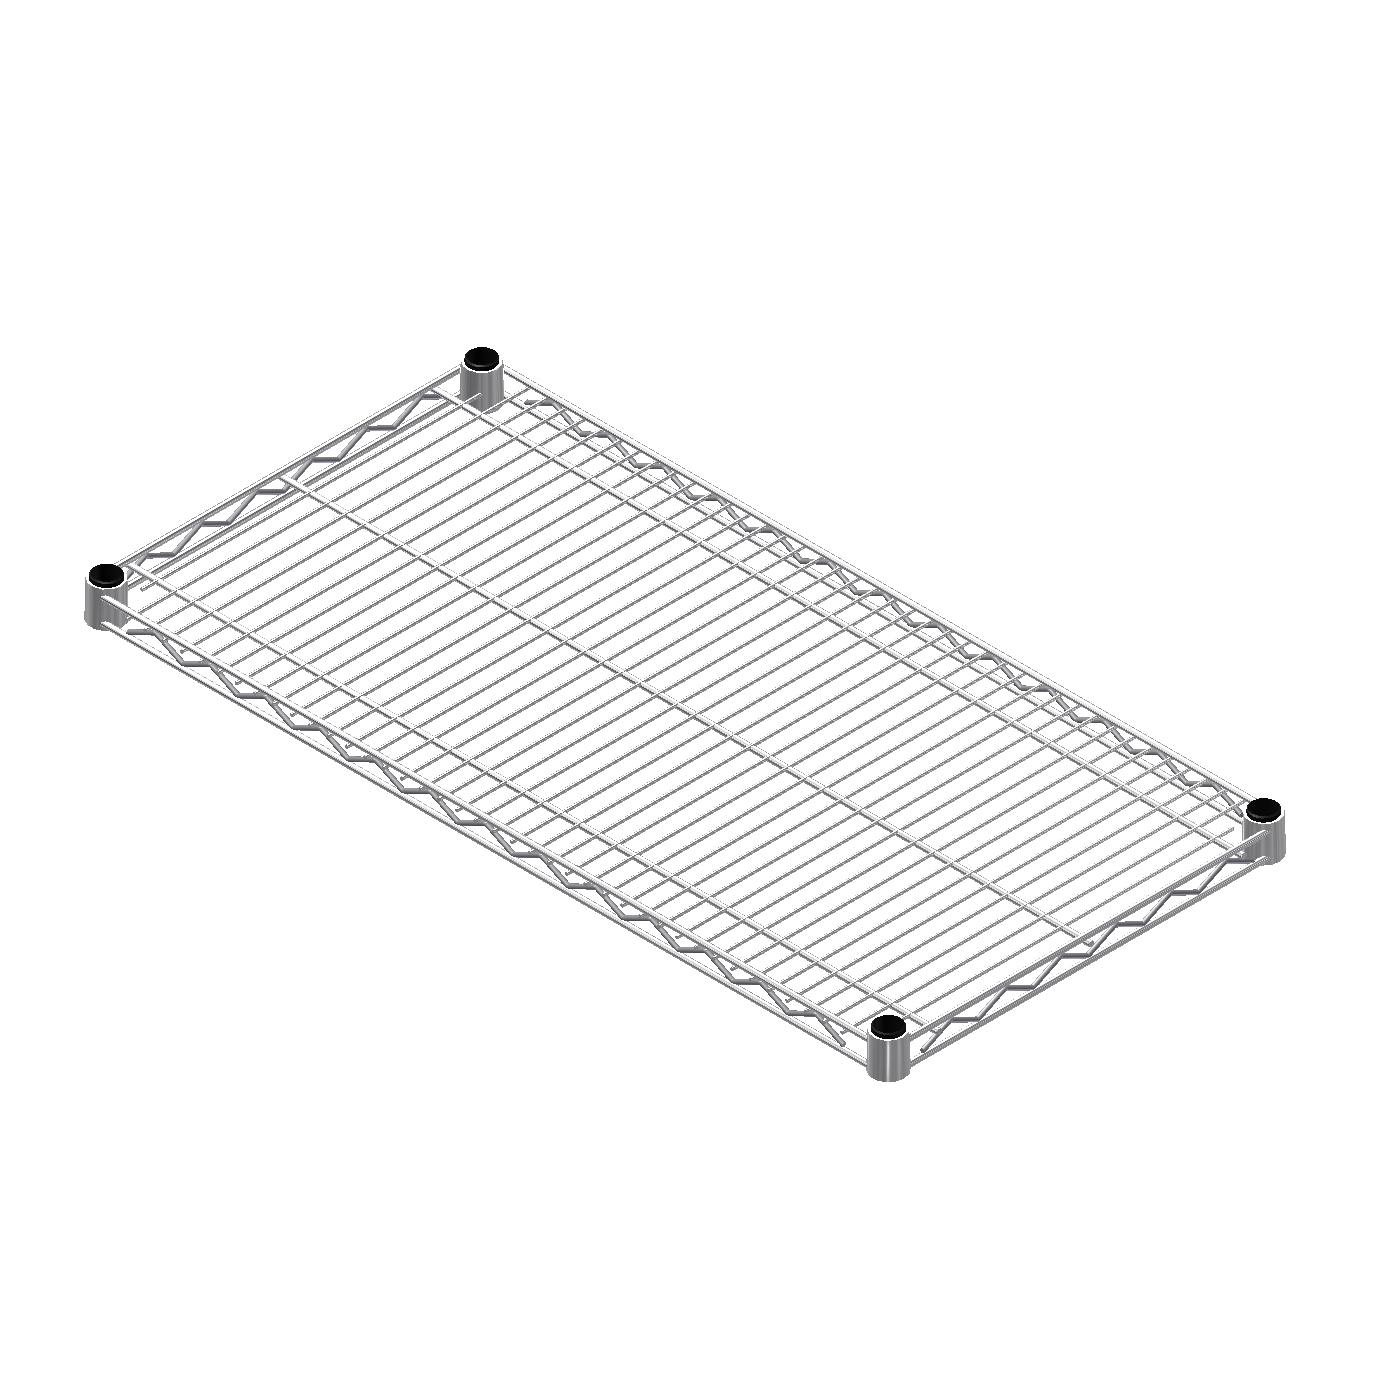 24 X 48 Heavy Duty Metal Wire Shelf